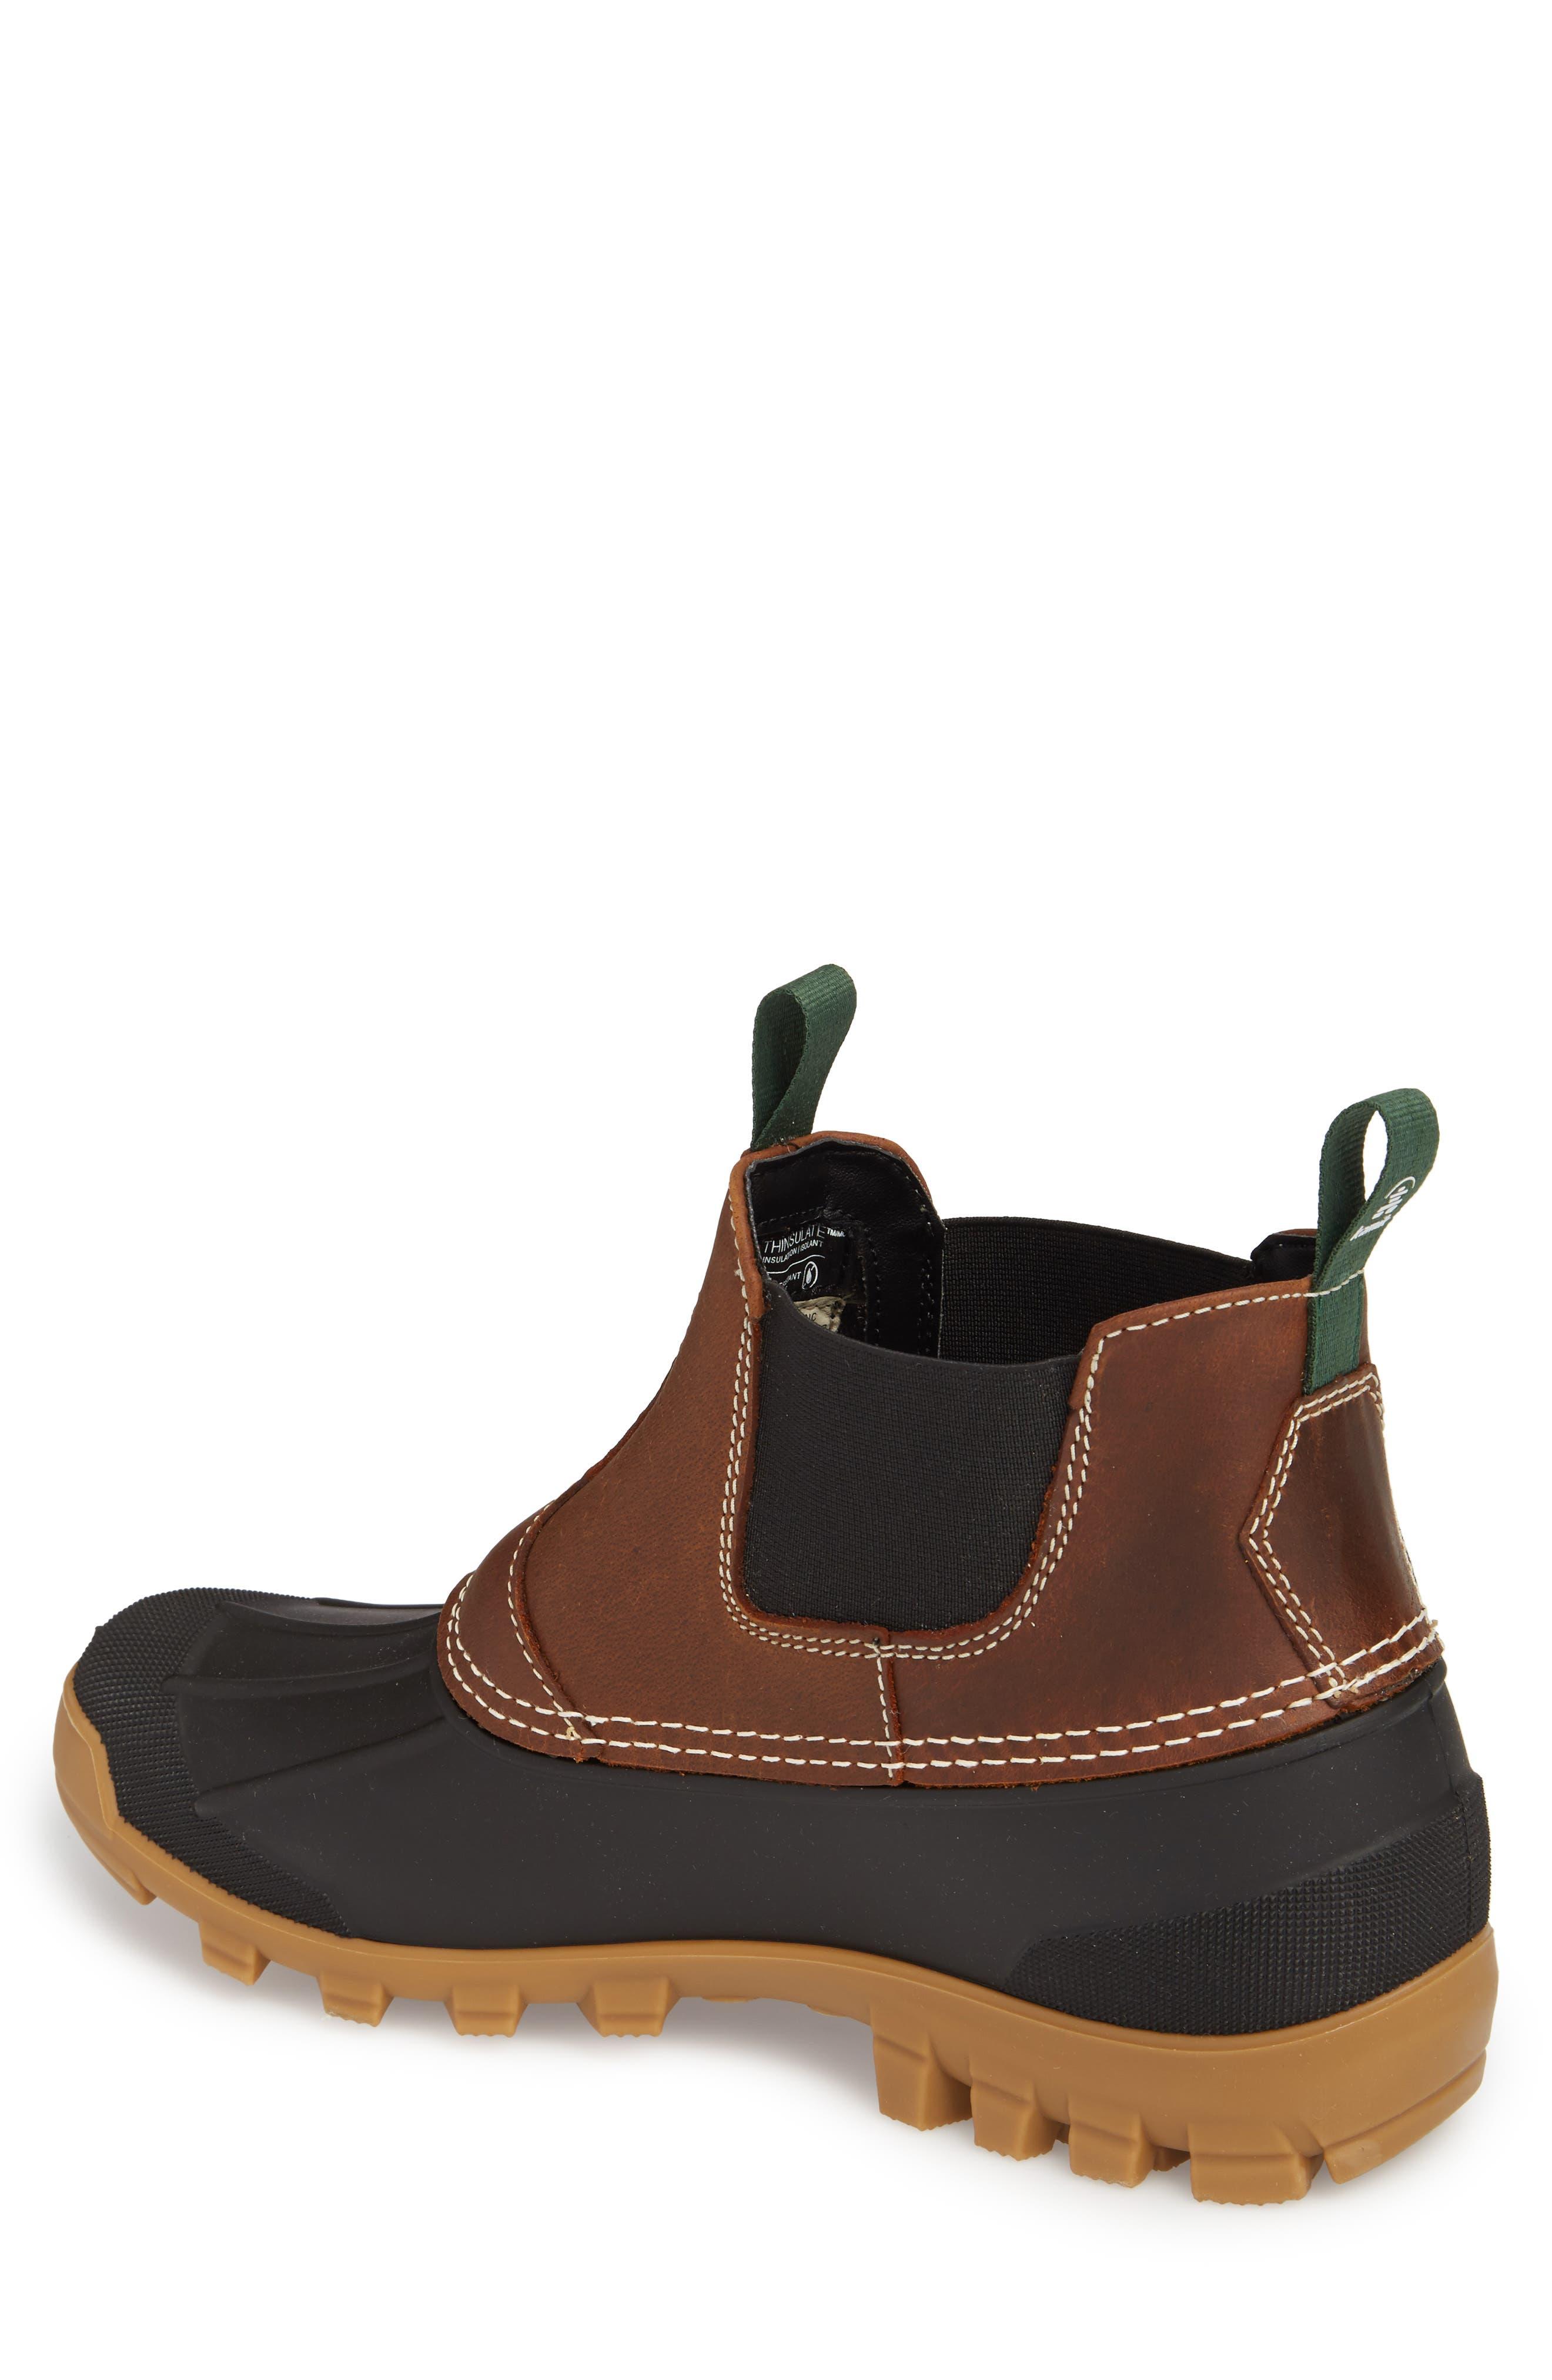 Yukon Chelsea Boot,                             Alternate thumbnail 2, color,                             Dark Brown Leather